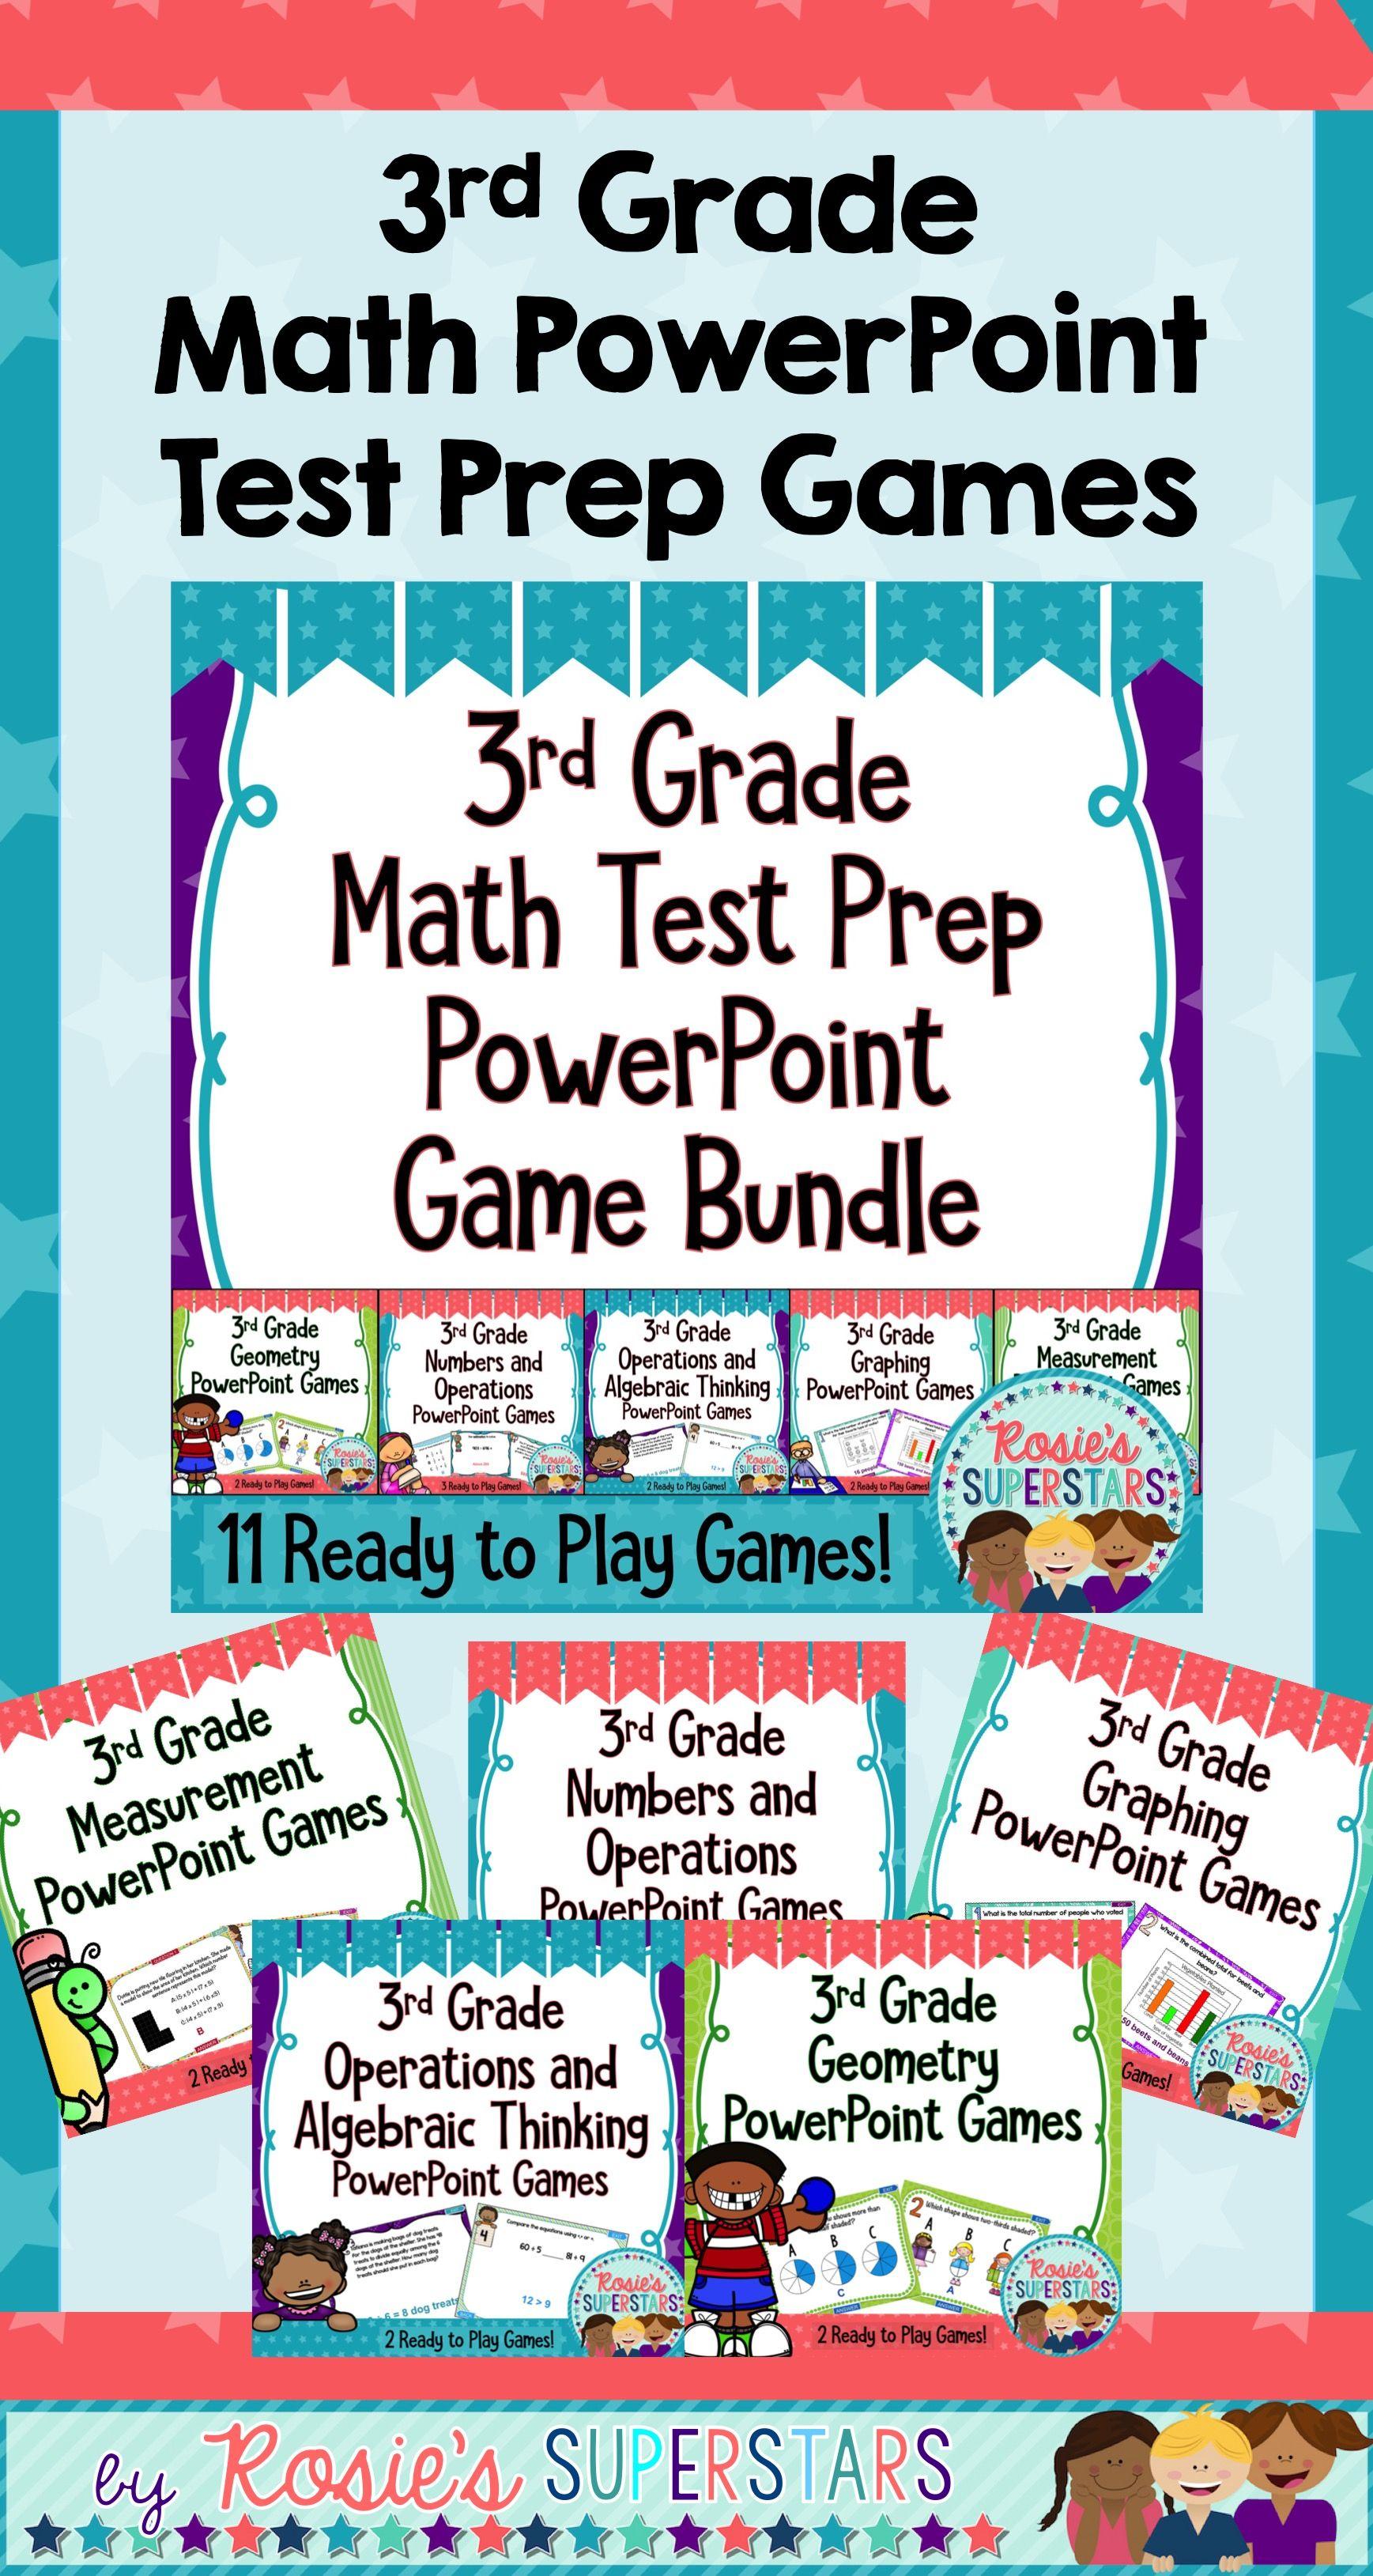 3rd Grade Math Test Prep Digital Game Bundle: 12 Games & 130 ...